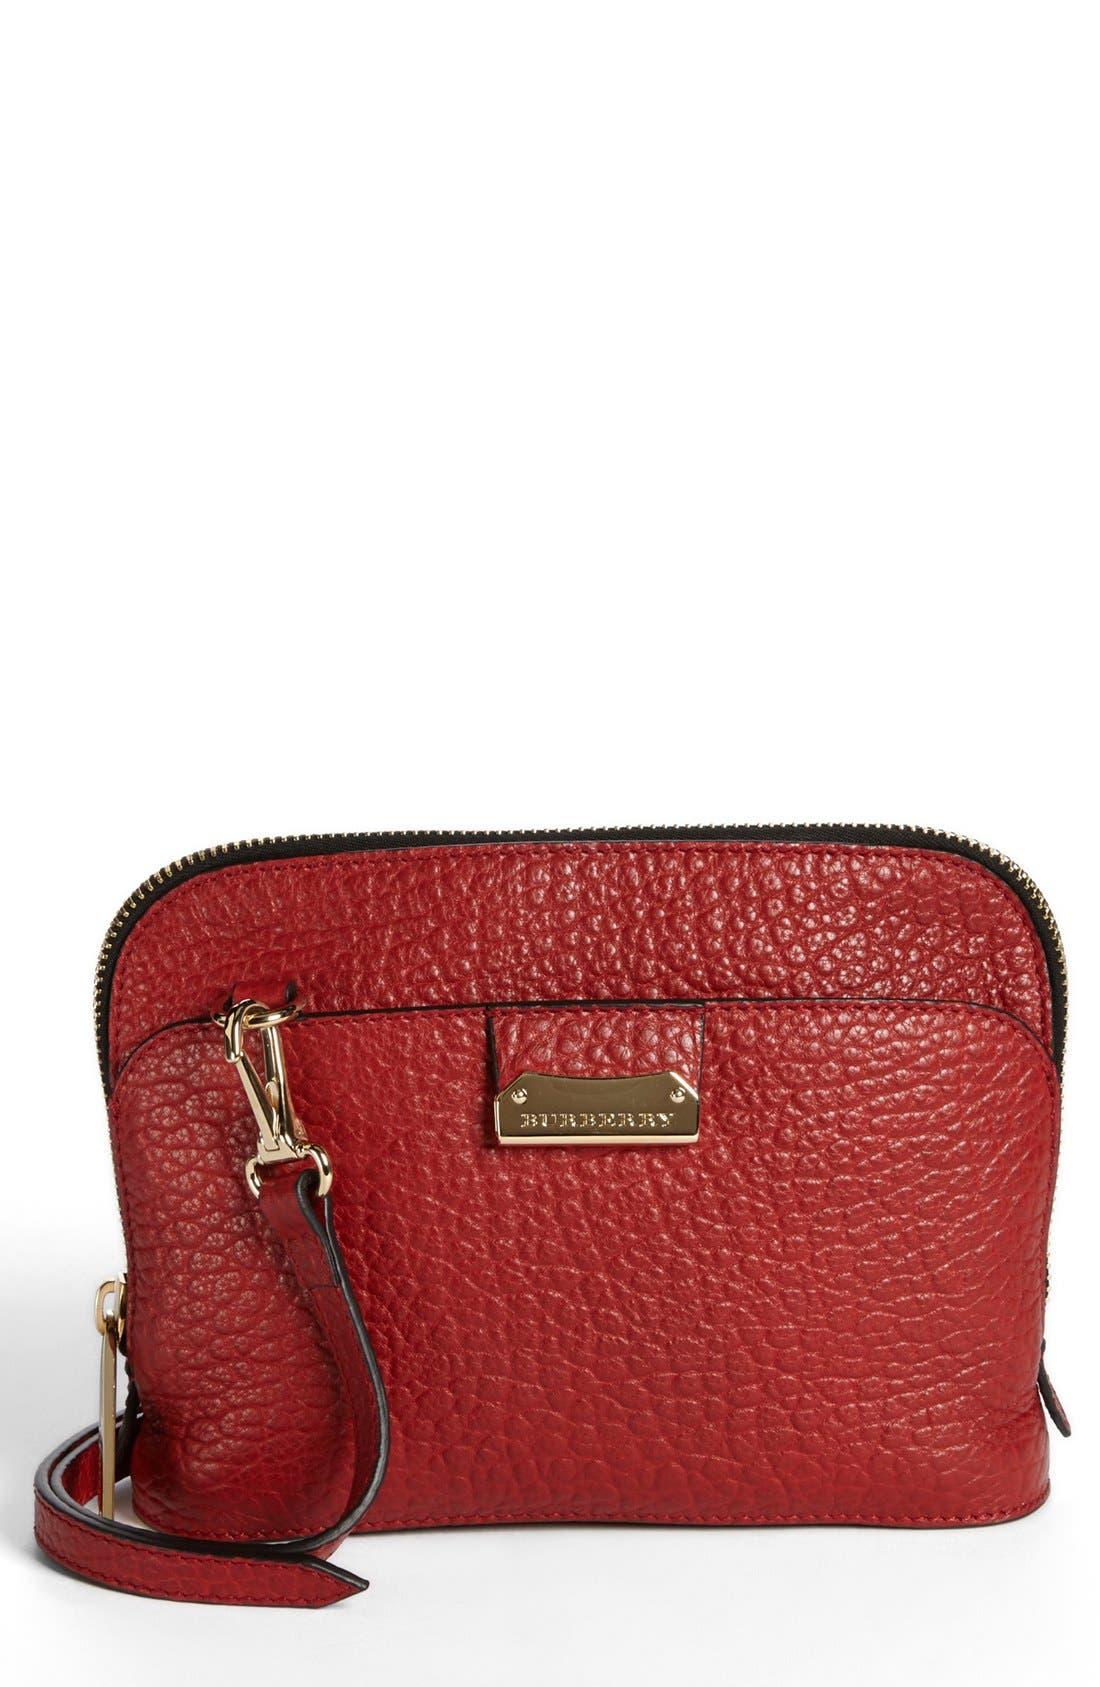 BURBERRY 'Small Harrogate' Leather Crossbody Bag, Main, color, 608